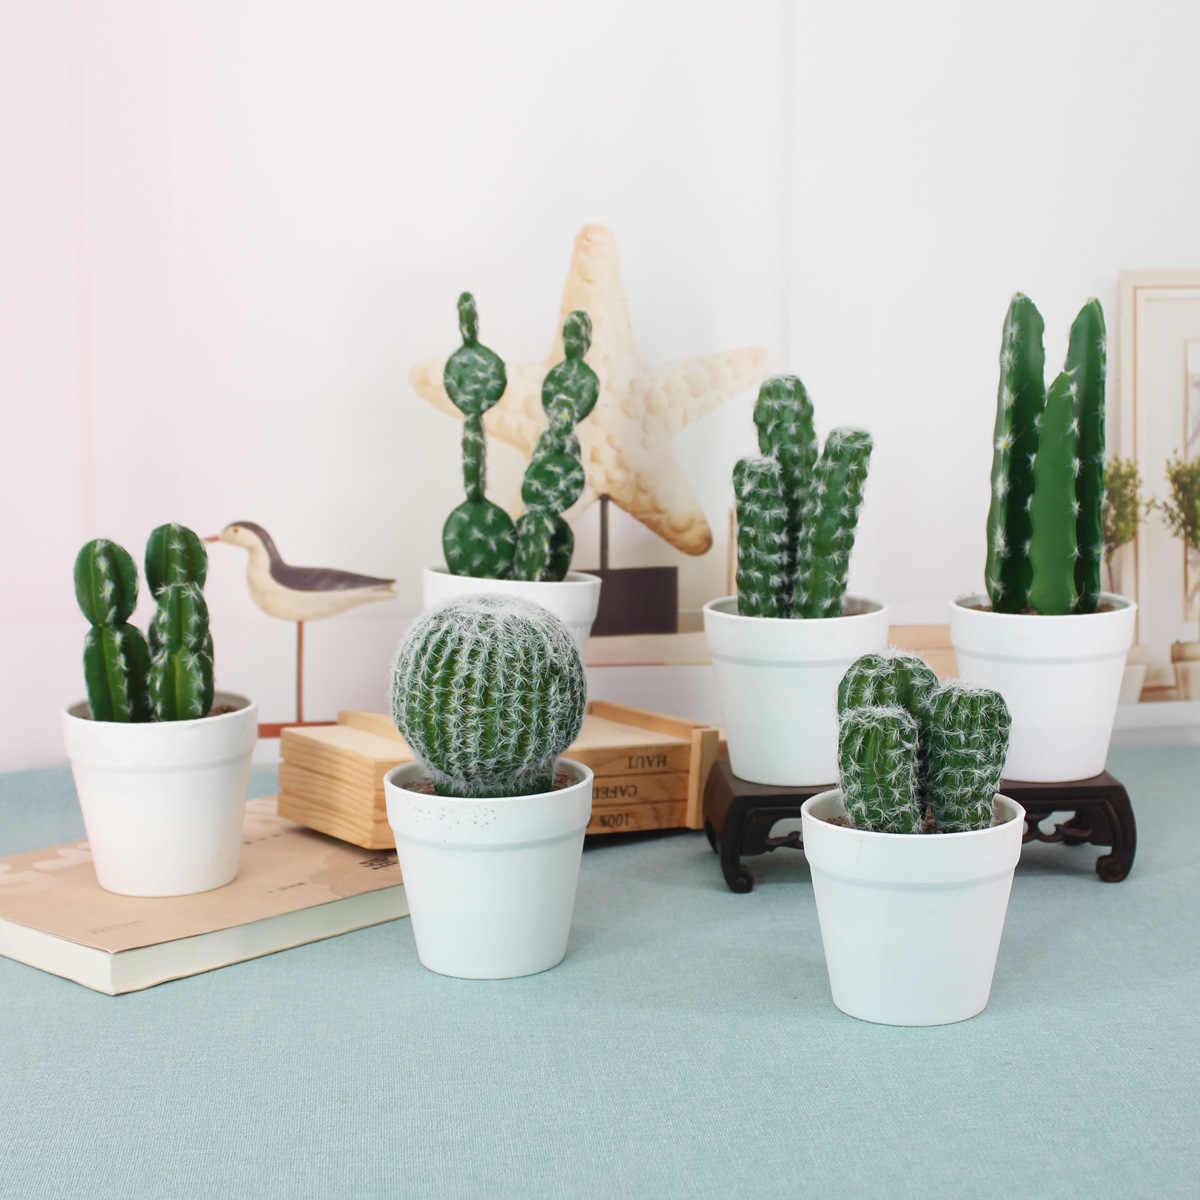 Artificial Succulents Plants Fake Bonsai Cactus Home Garden Wedding Decoration